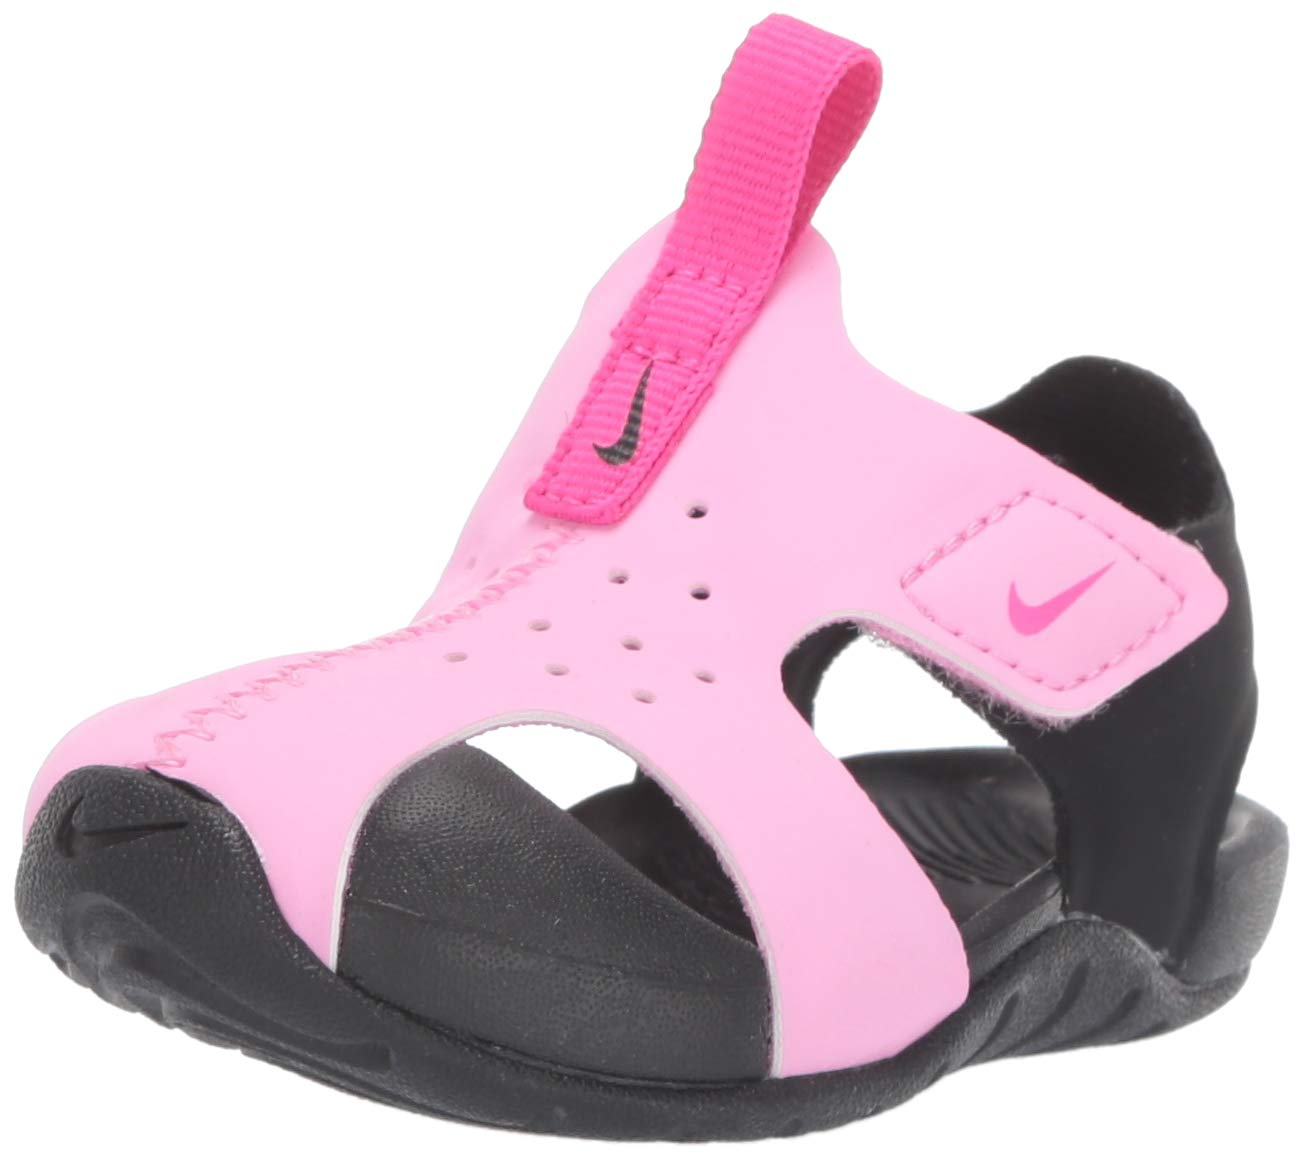 Nike Toddler Kid's Sunray Protect 2 Sandal, Psychic Pink/Laser Fuchsia/Black, 8 M US Toddler